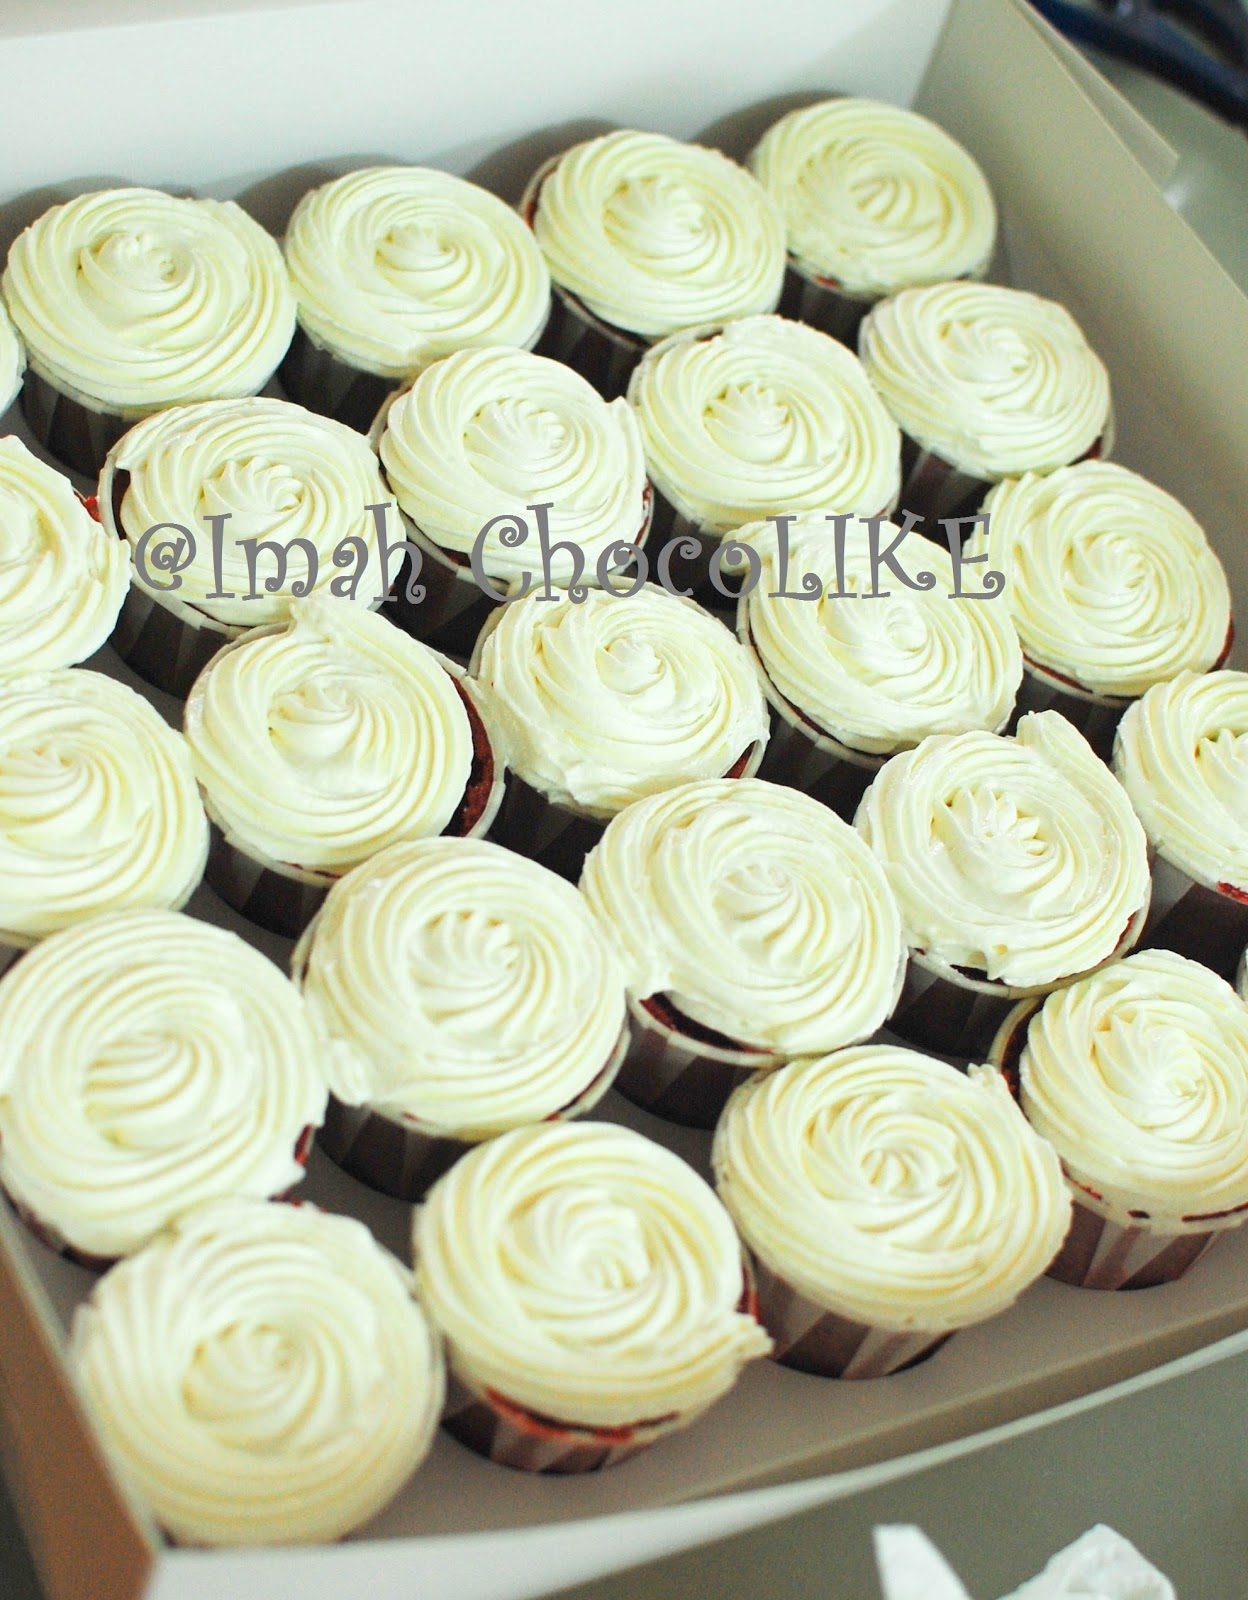 Cake Decorating Cream Cheese Frosting : Imah ChocoLIKE: Tips CREAM CHEESE FROSTING - decorating ...